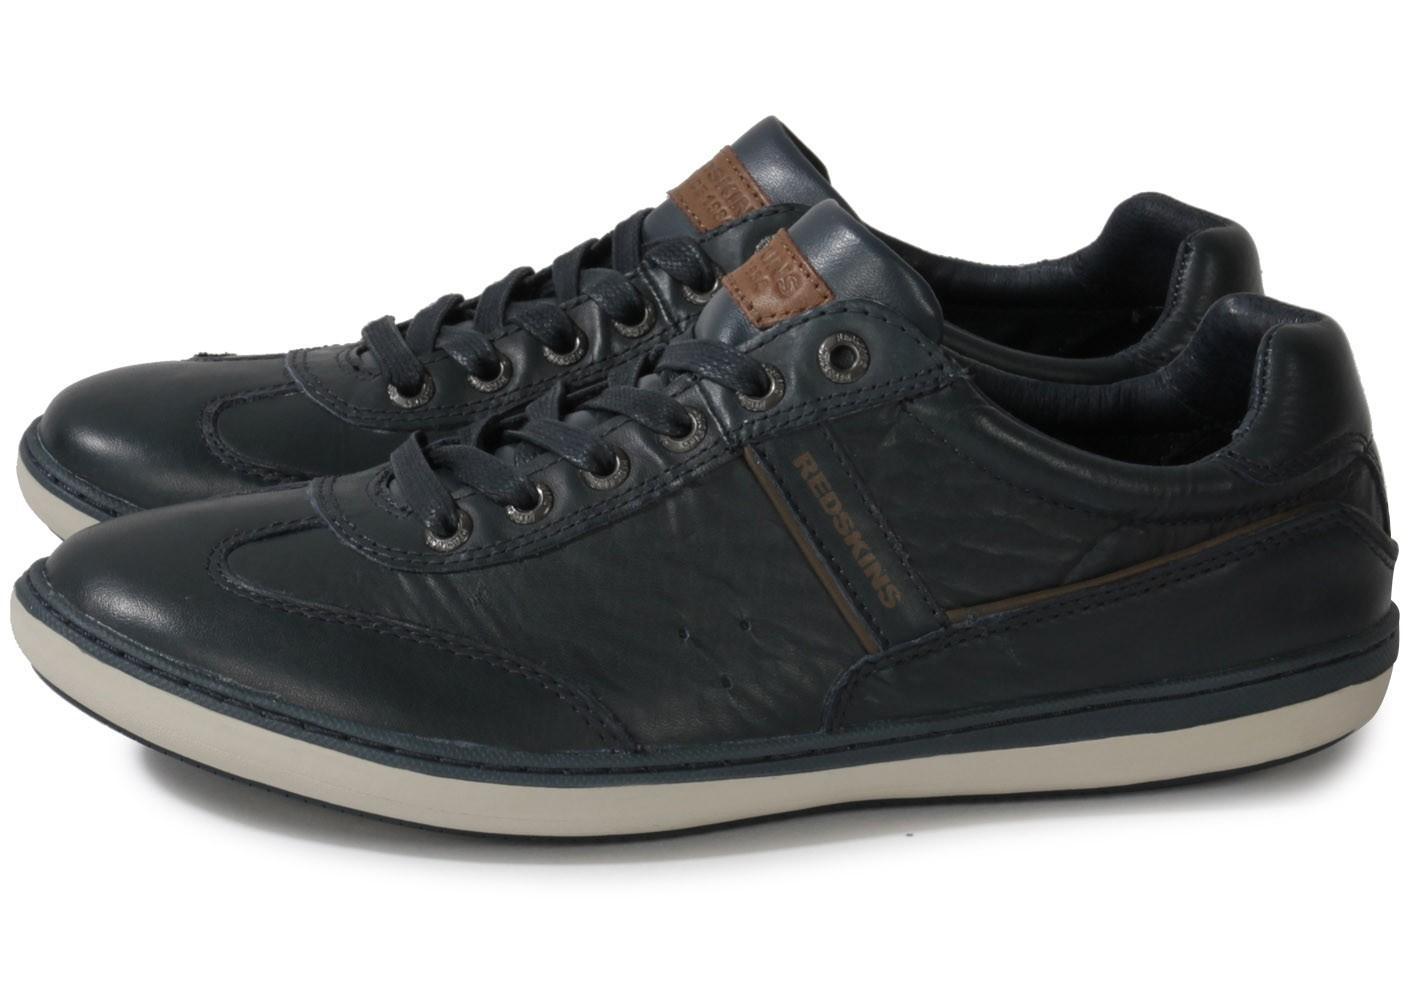 Chaussures Redskins Olbia - Cuir bleu, Tailles 40 , 41 , 43 et 44